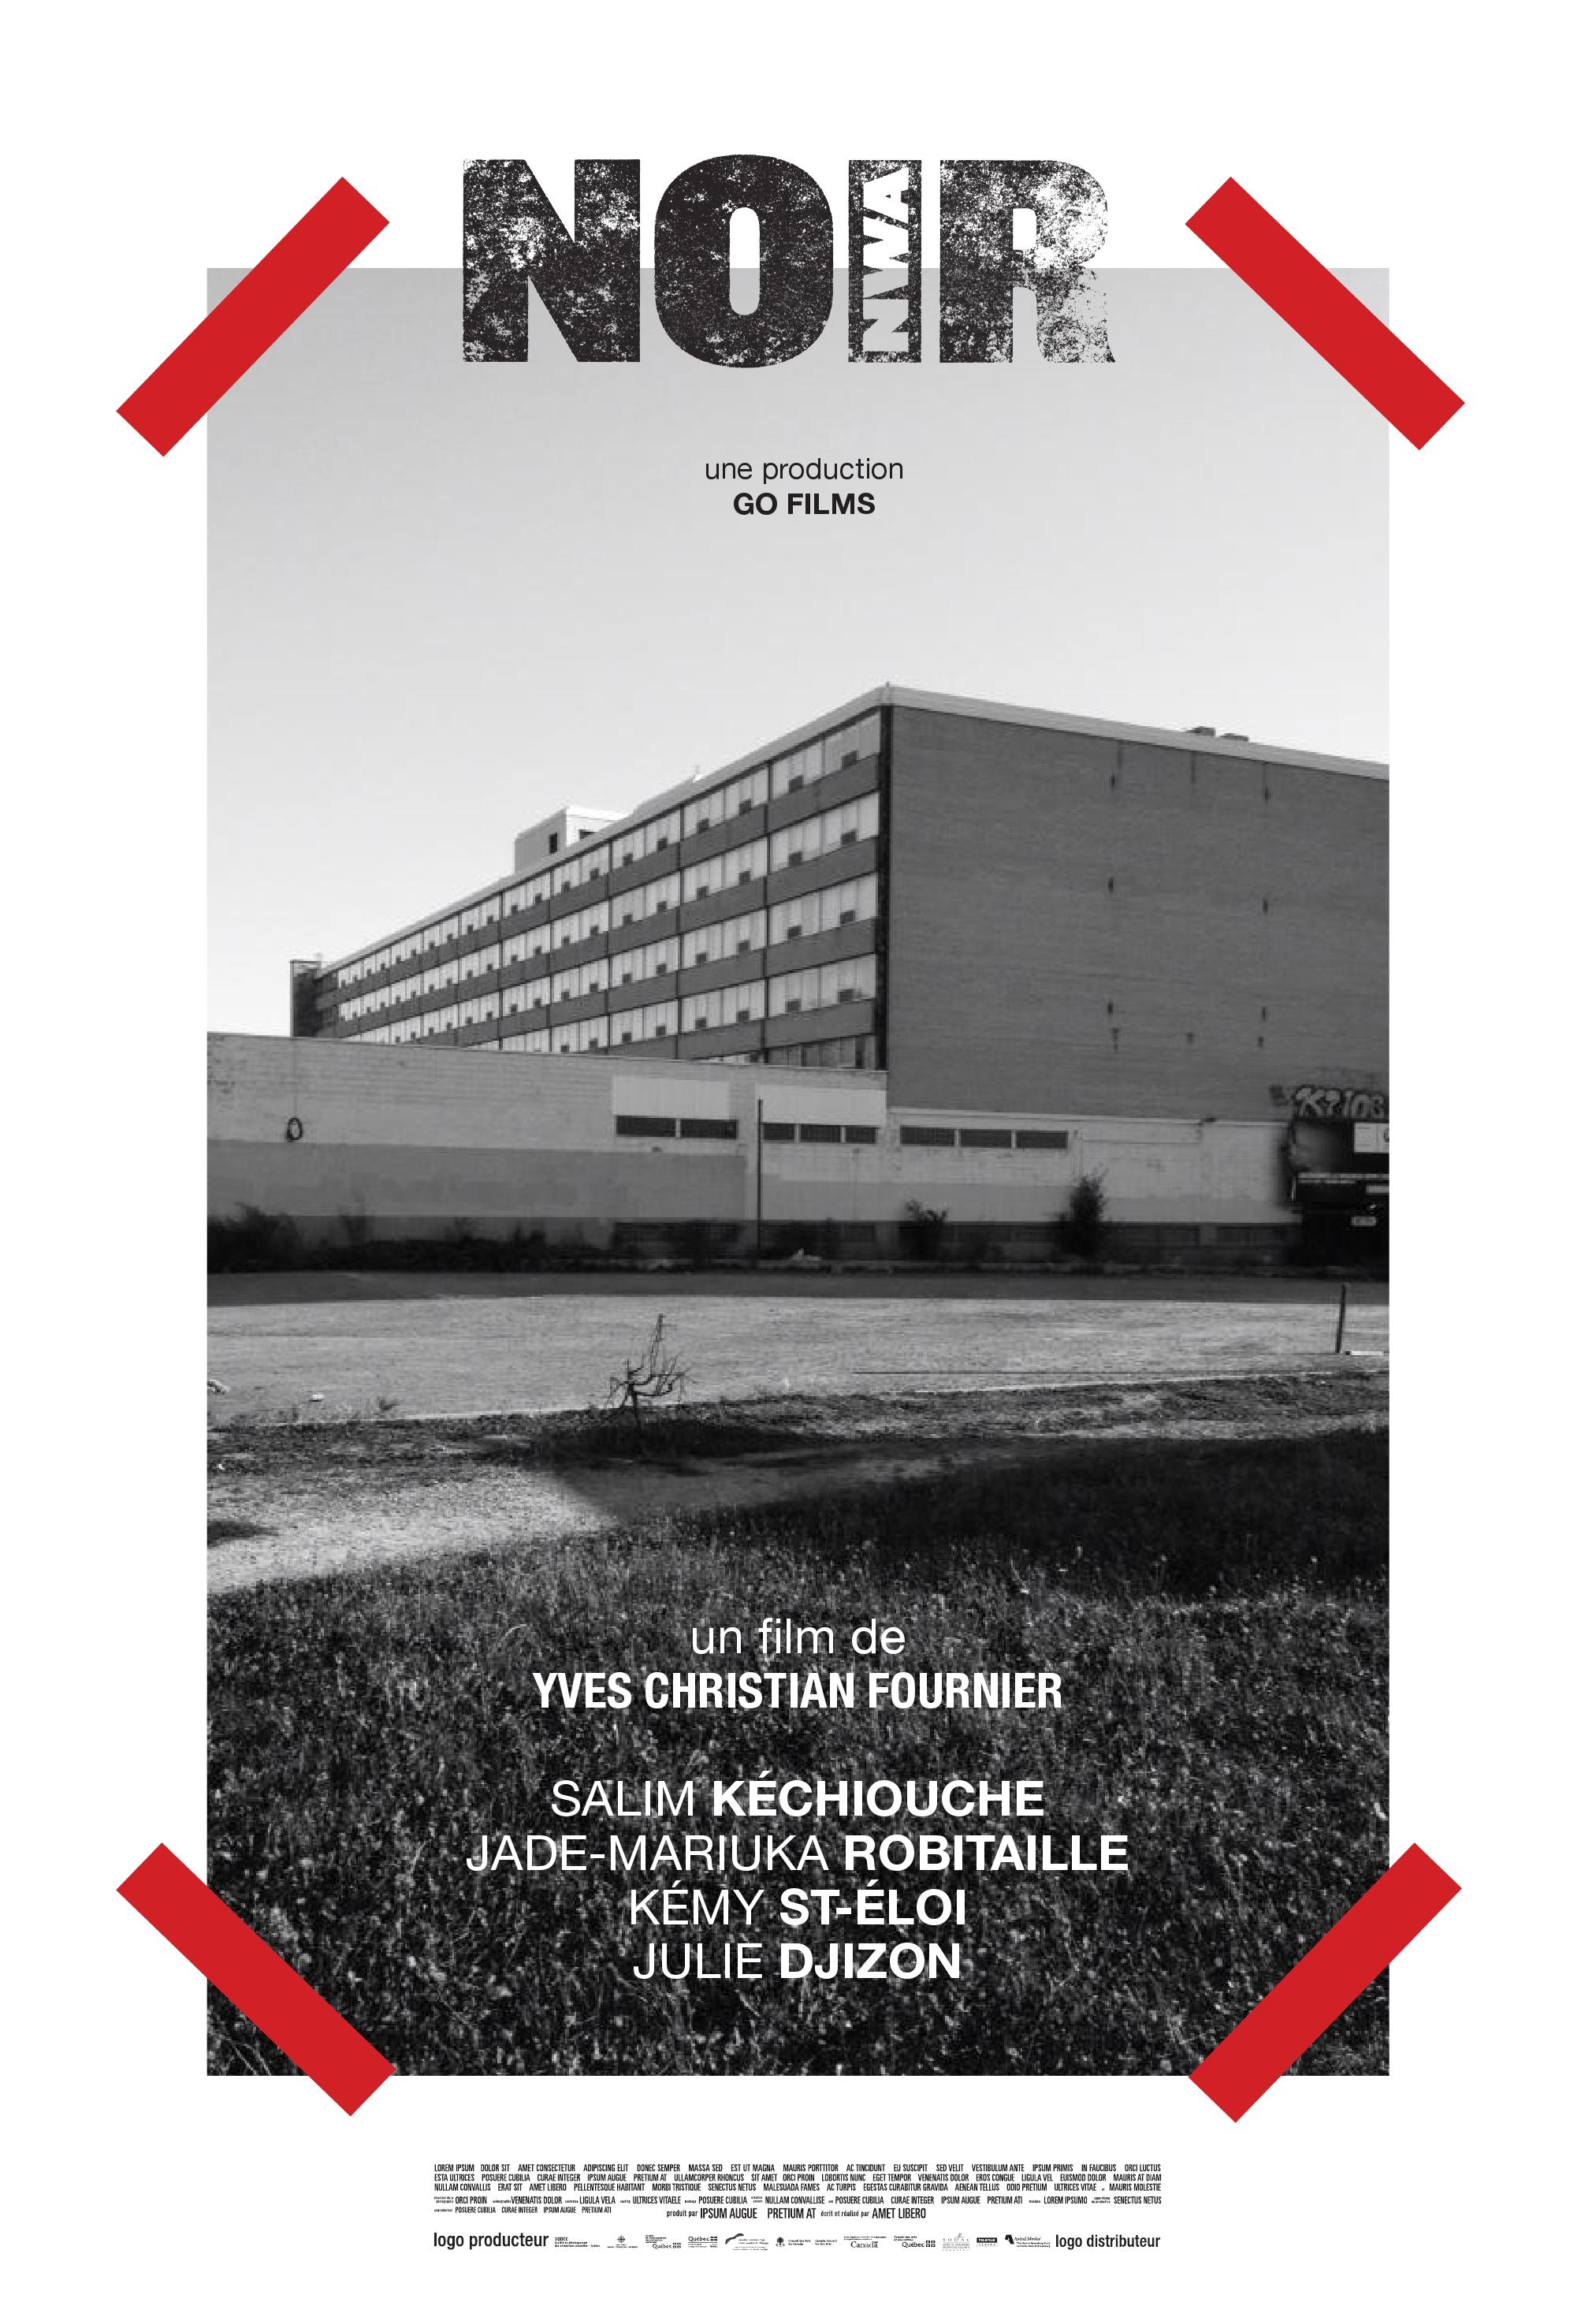 NOIR-Poster-RENZO-13oct-1_00026.jpg